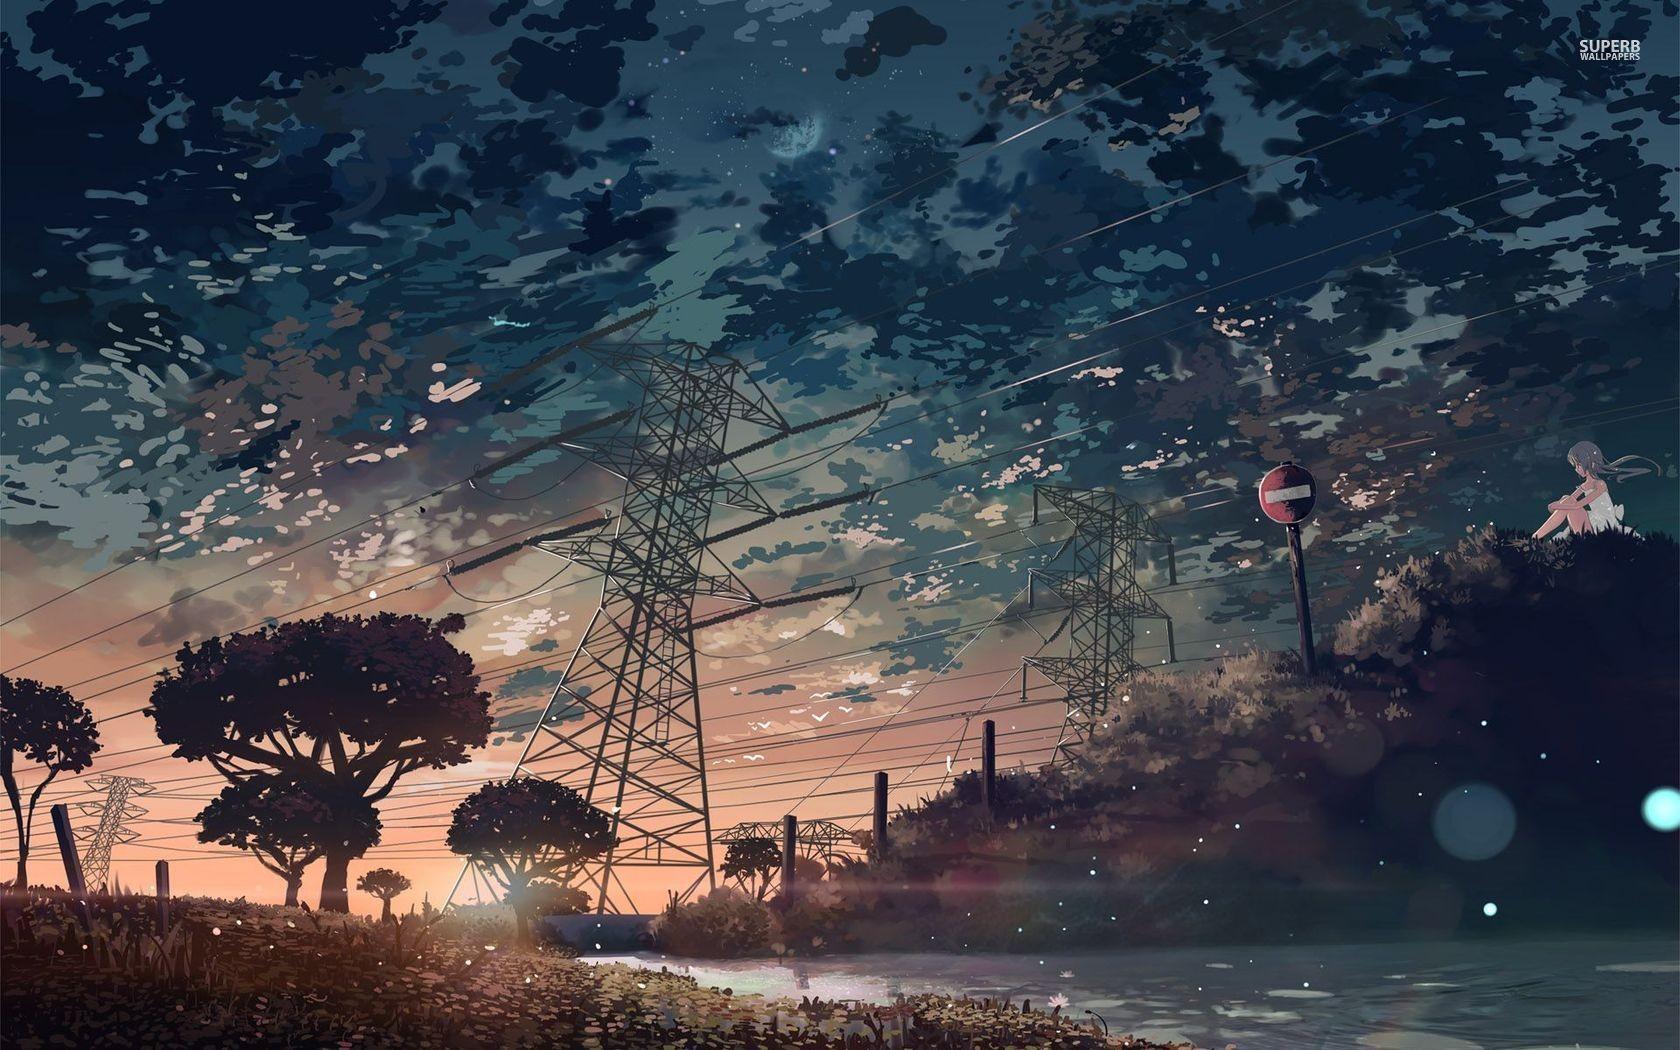 Wallpaper Sunlight Sunset Cityscape Night Anime Reflection Sky Artwork Clouds Sunrise Manga Sign Evening Morning Moonlight Horizon Dusk